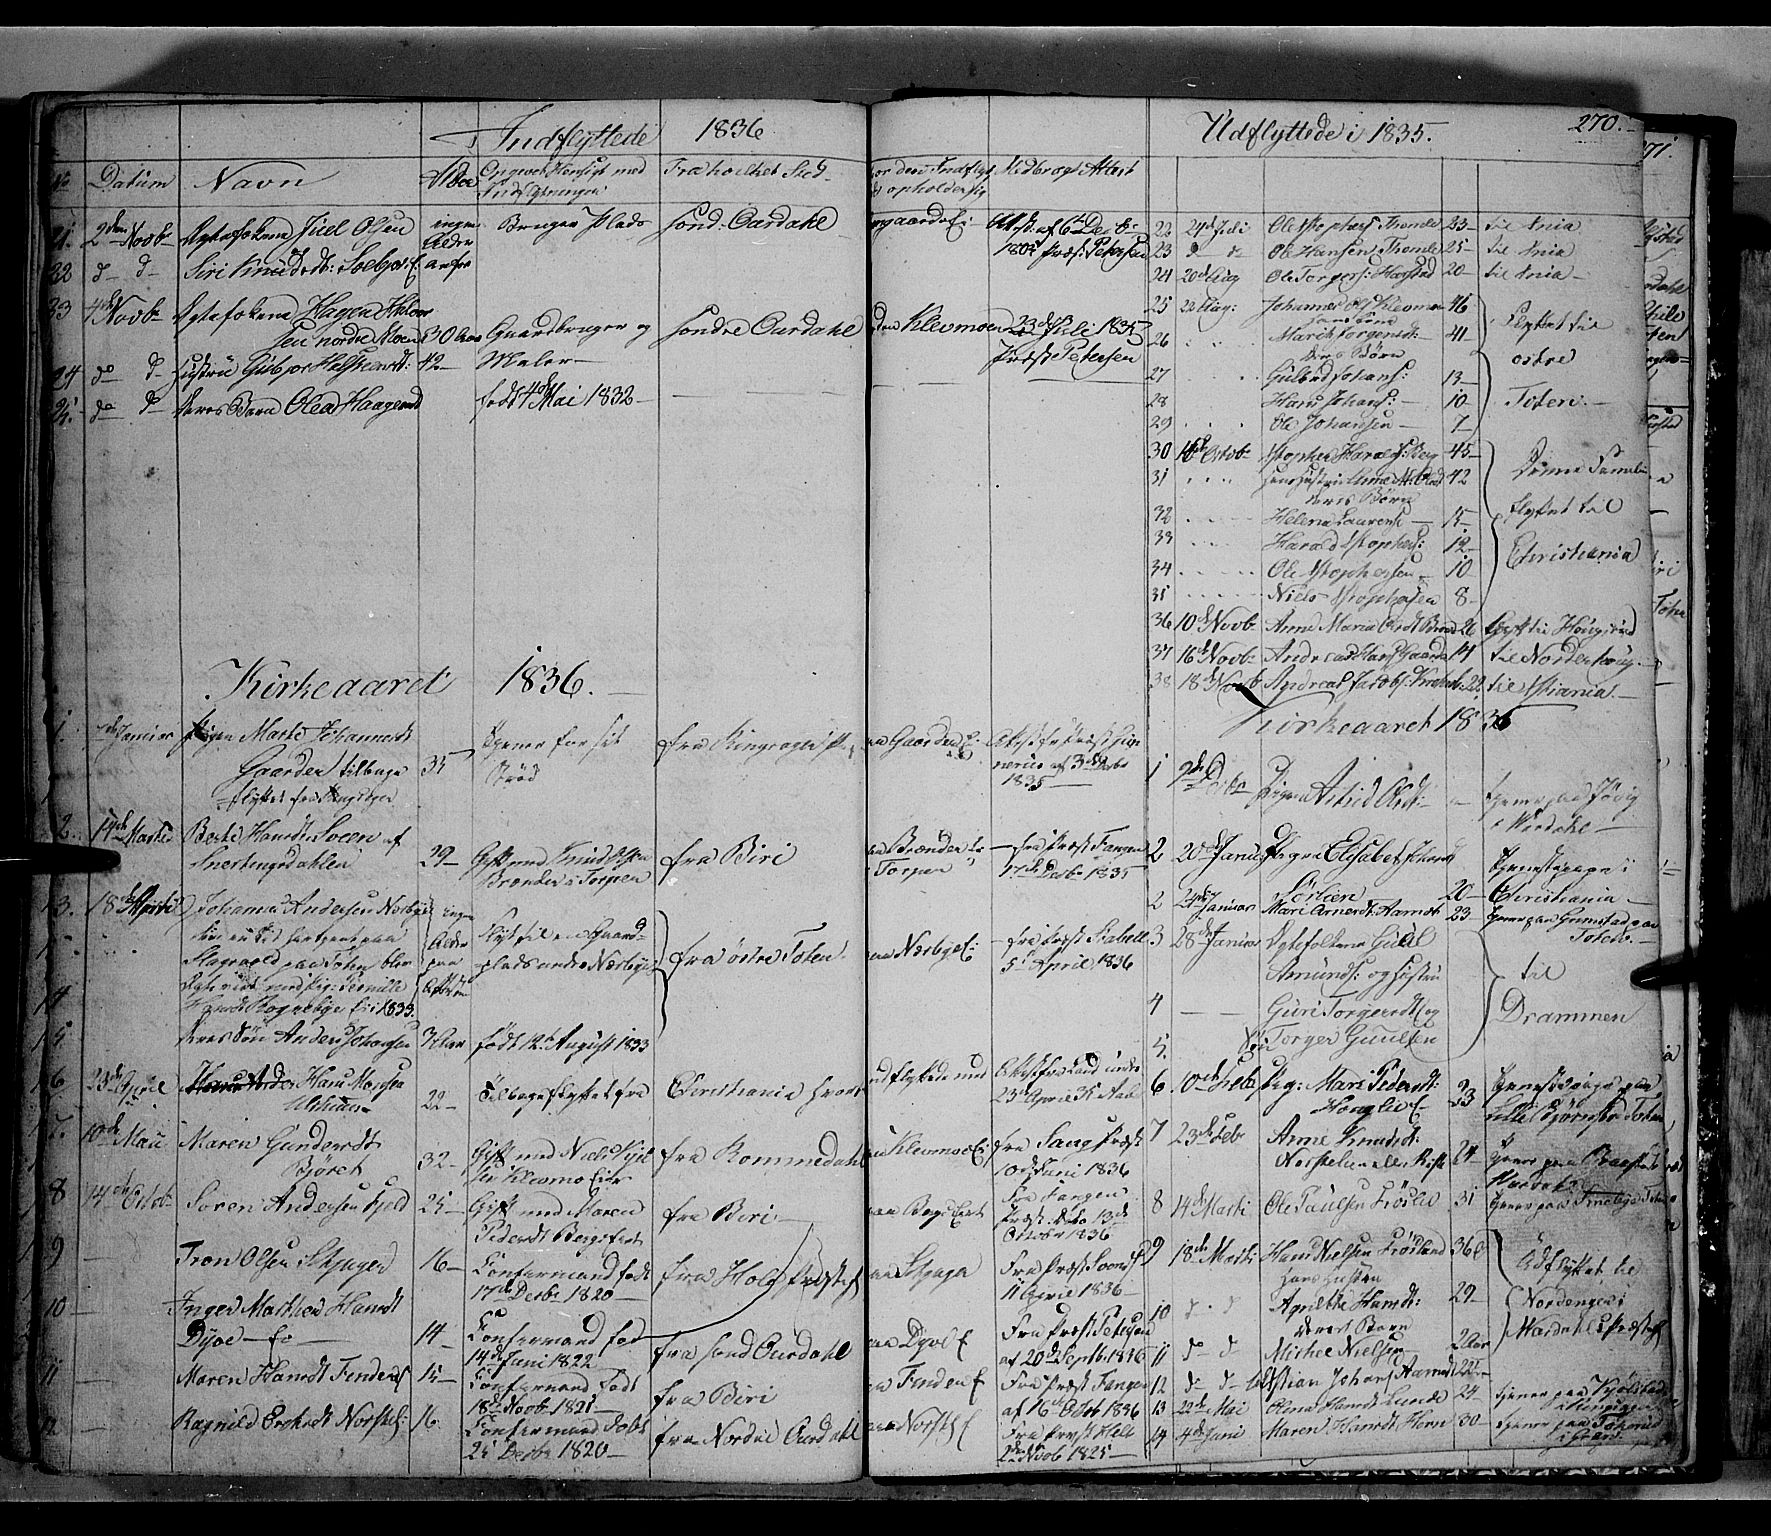 SAH, Land prestekontor, Klokkerbok nr. 2, 1833-1849, s. 270